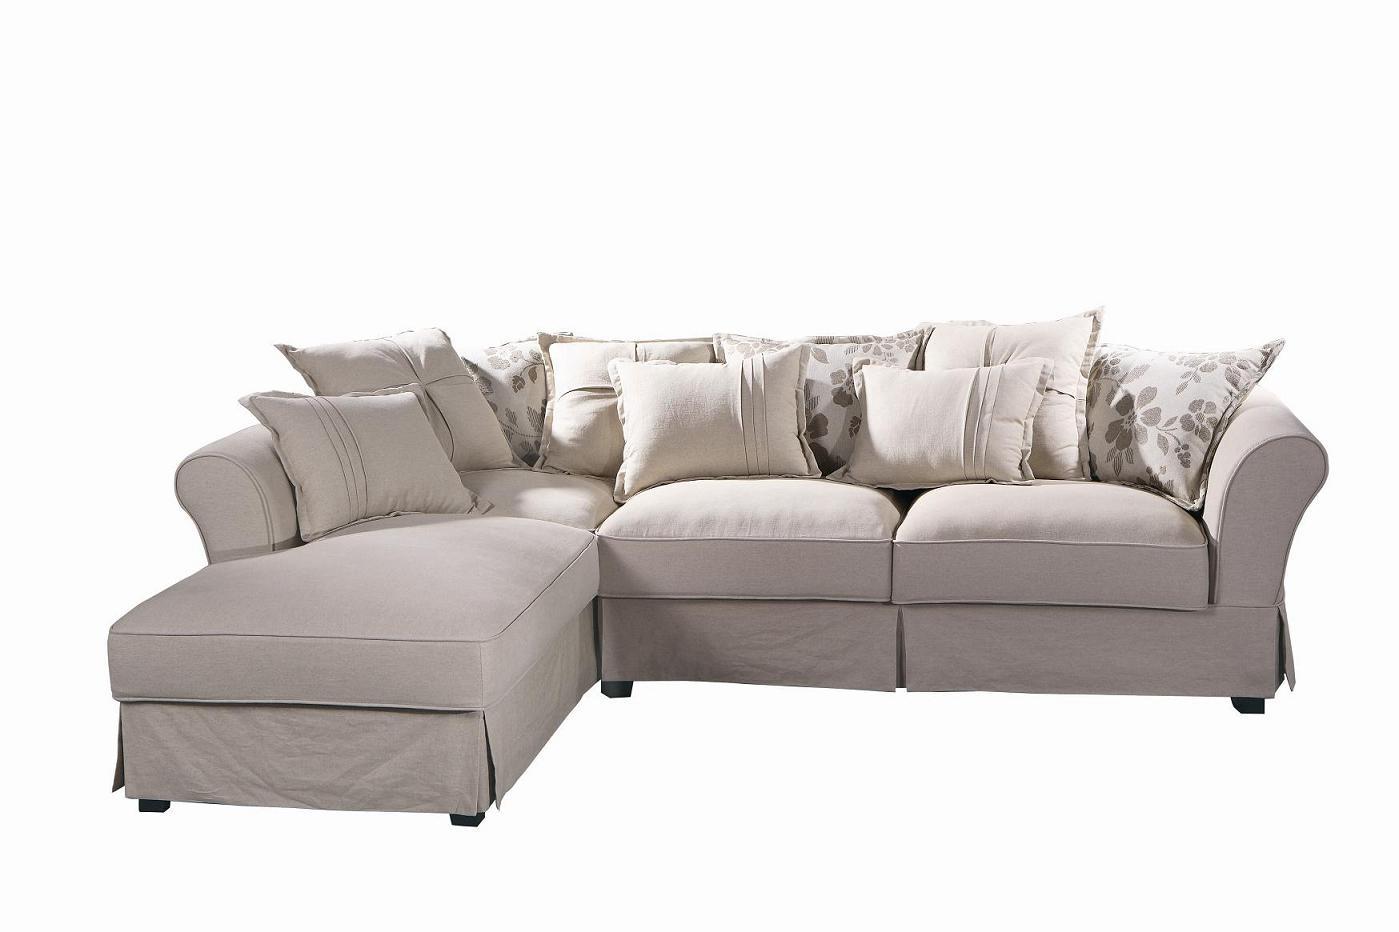 Uncategorized: Inspirations Affordable Sectionals Sectional Couch With Affordable Sectional Sofas (Image 9 of 10)